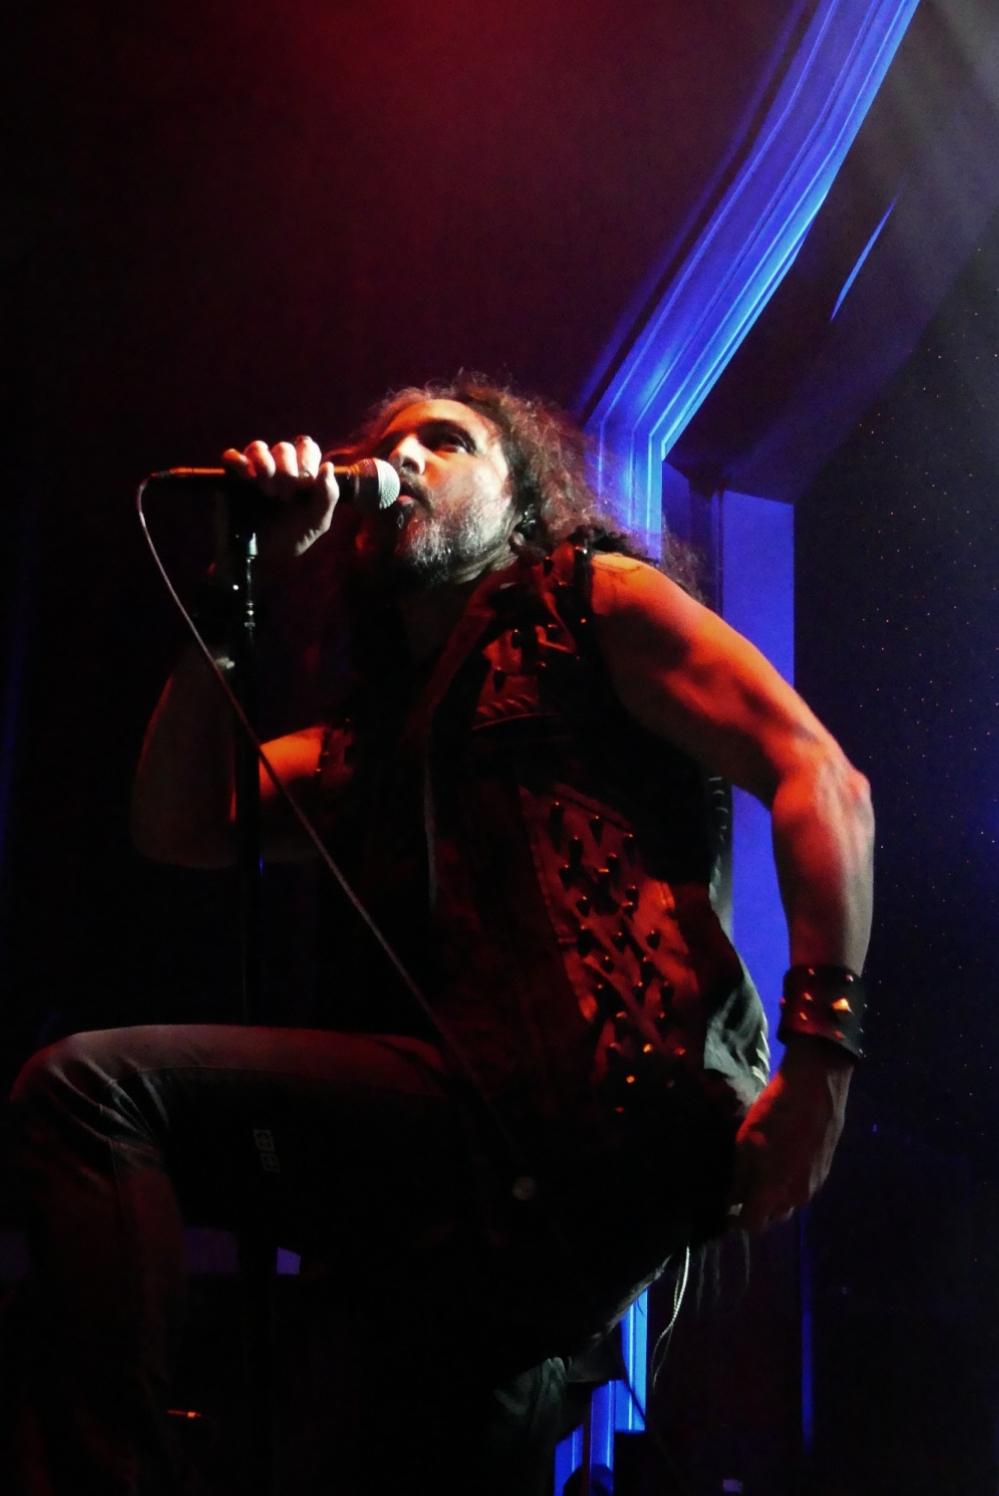 DEATH-ANGEL-70000-tons-of-metal-2017-vampster_3